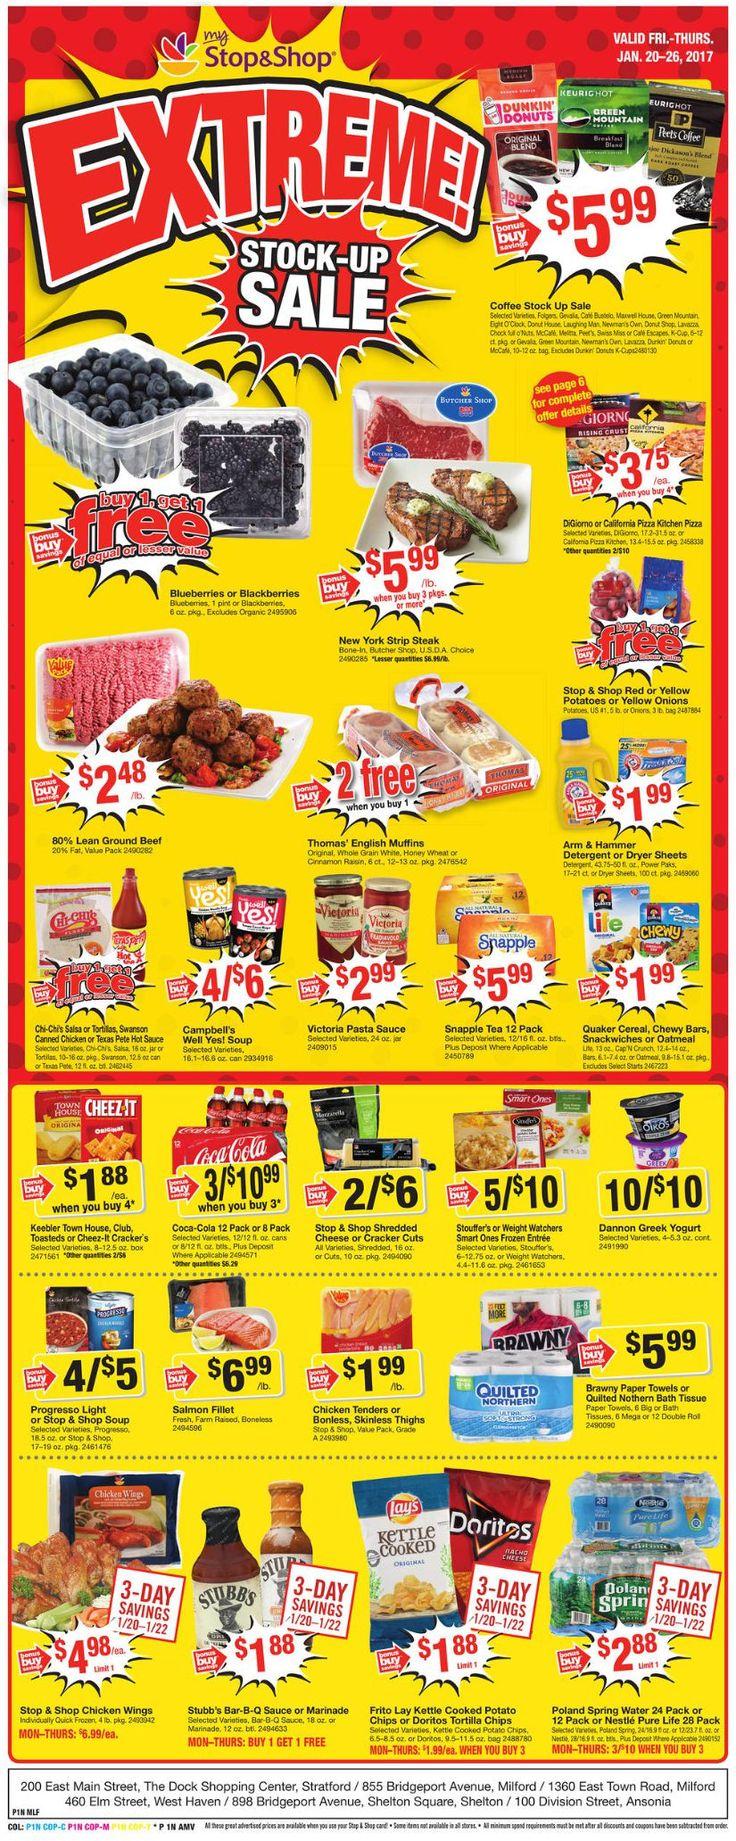 Stop and Shop Circular January 20 - 26, 2017 - http://www.olcatalog.com/grocery/stop-and-shop-circular.html